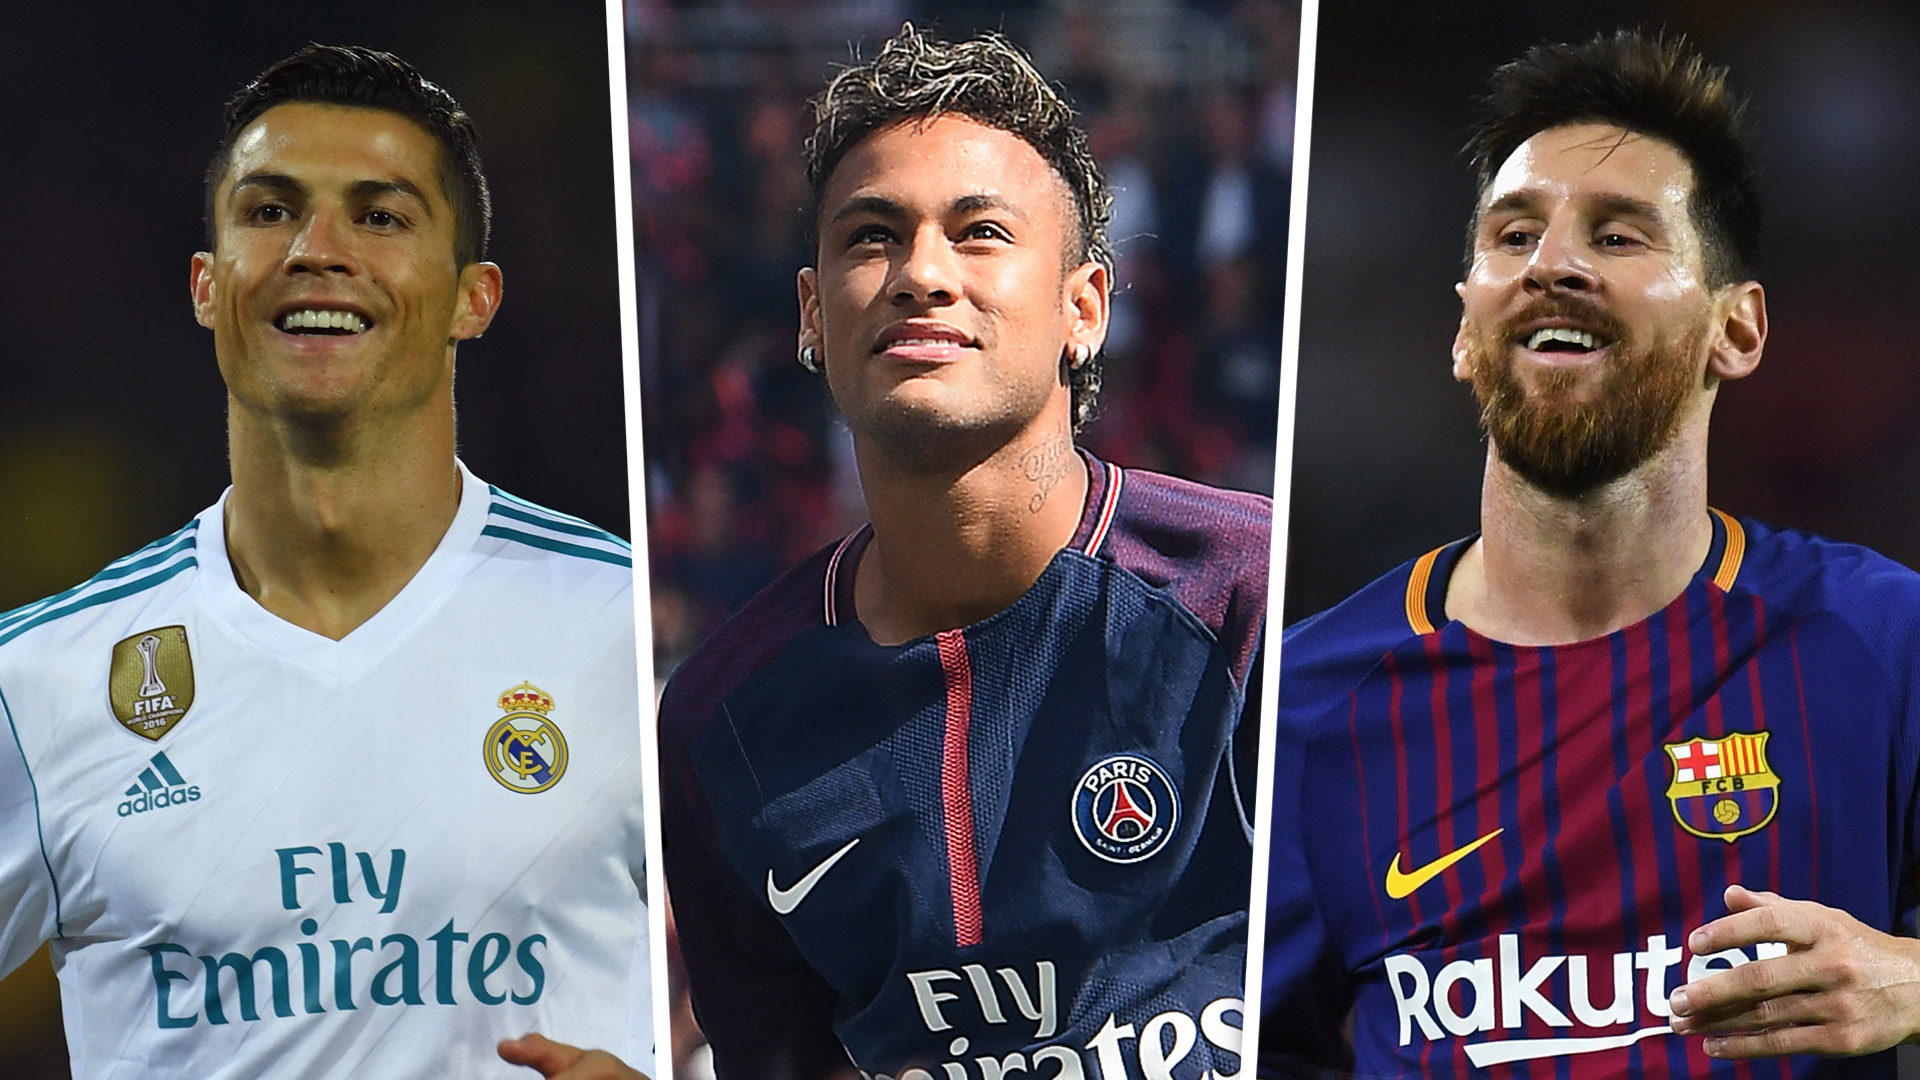 Ronaldo, Messi, Neymar